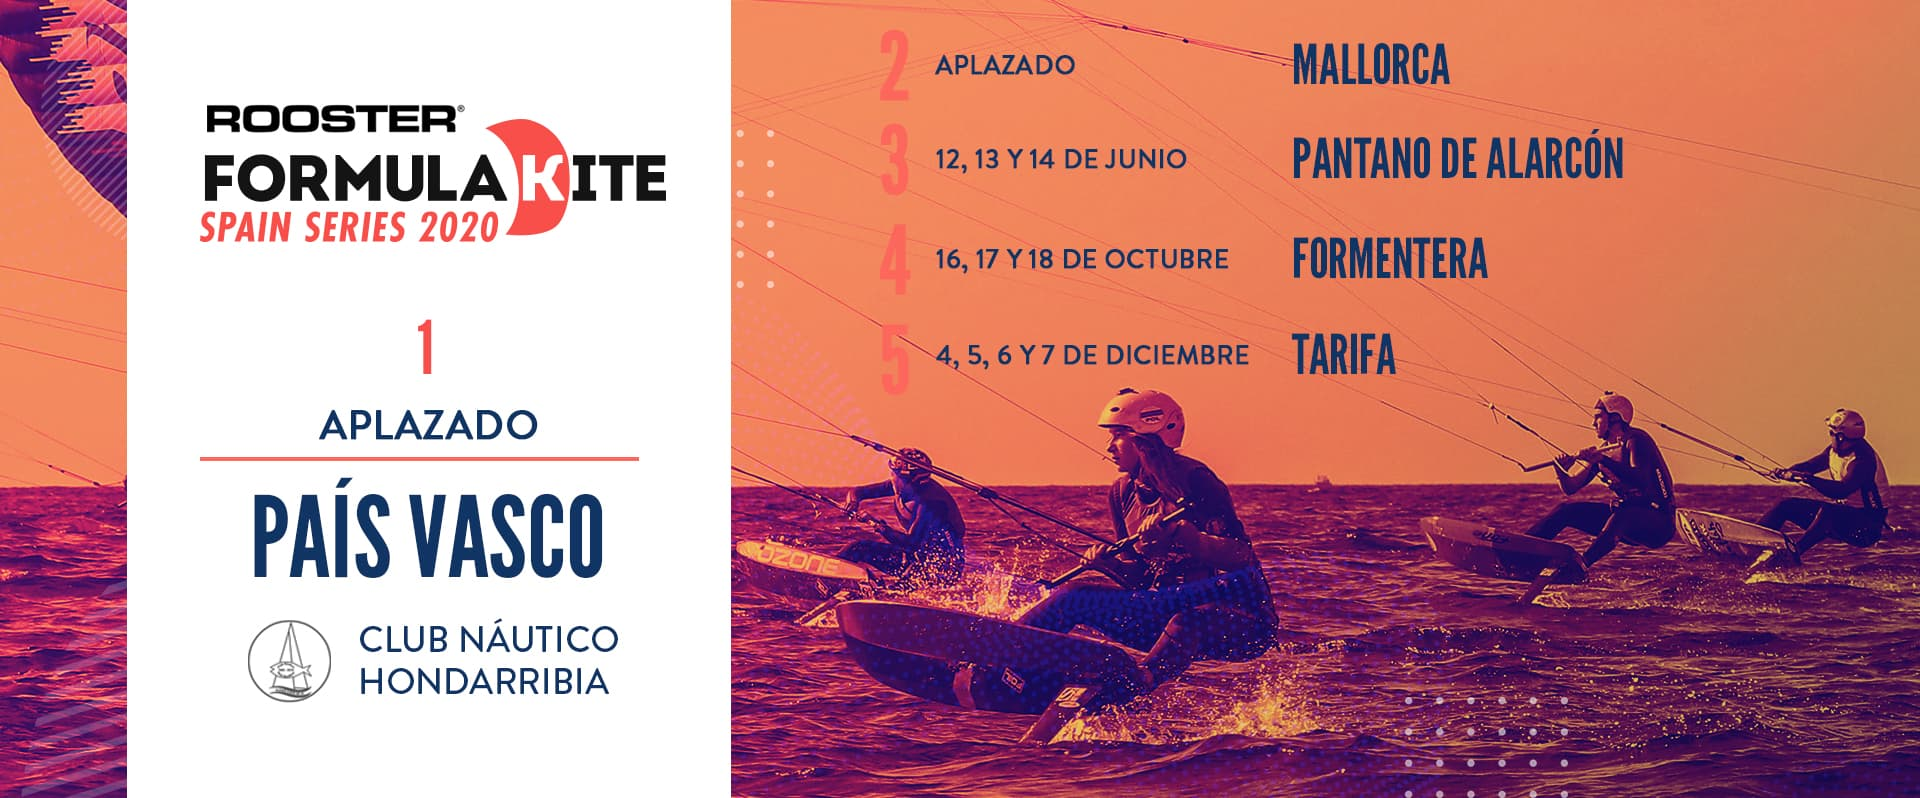 Banner FKSS 2020 APLAZADO - Spain Series